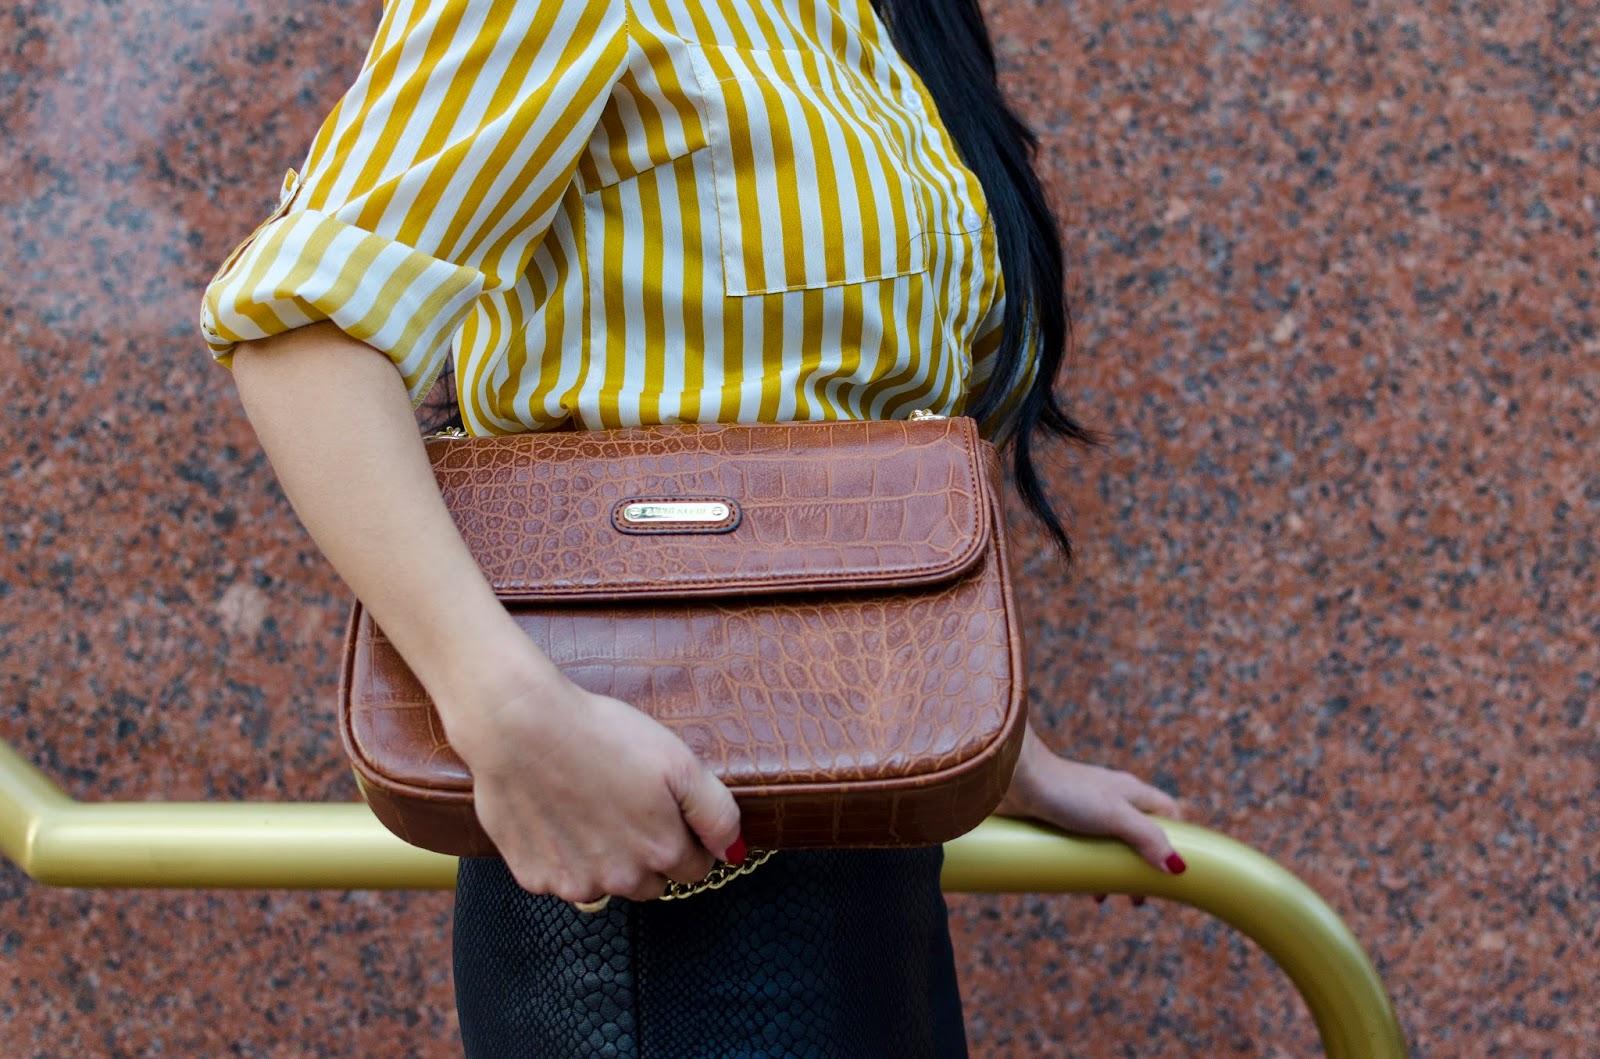 Striped Gold and White Shirt Anne Klein Brown Handbag Olivaceous Black Python Print Pencil Skirt